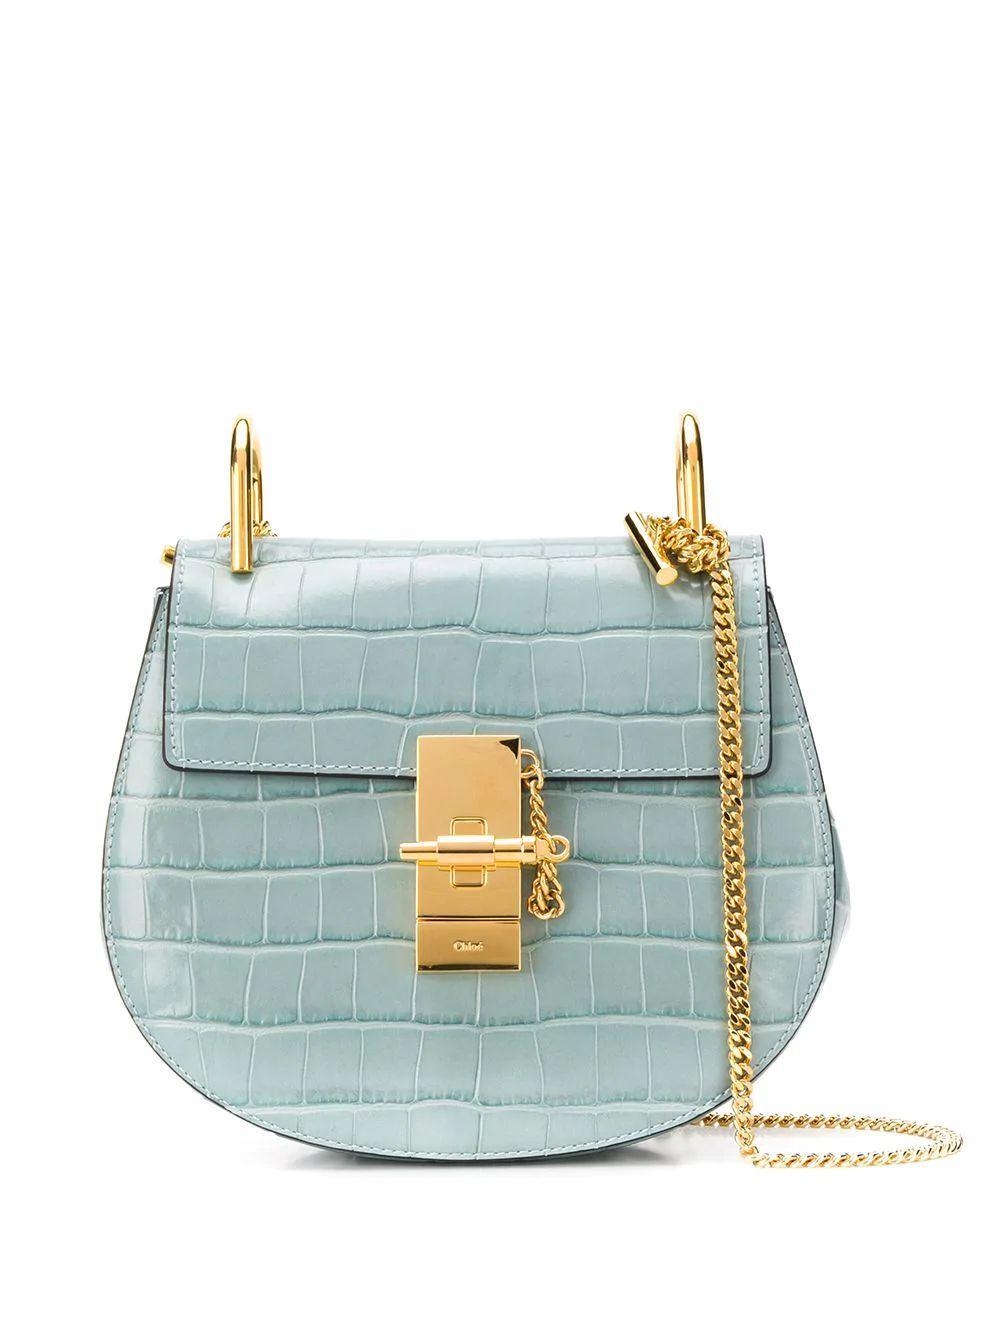 Drew Mini Embossed Croc Shoulder Bag Item # CHC19US032A8744L